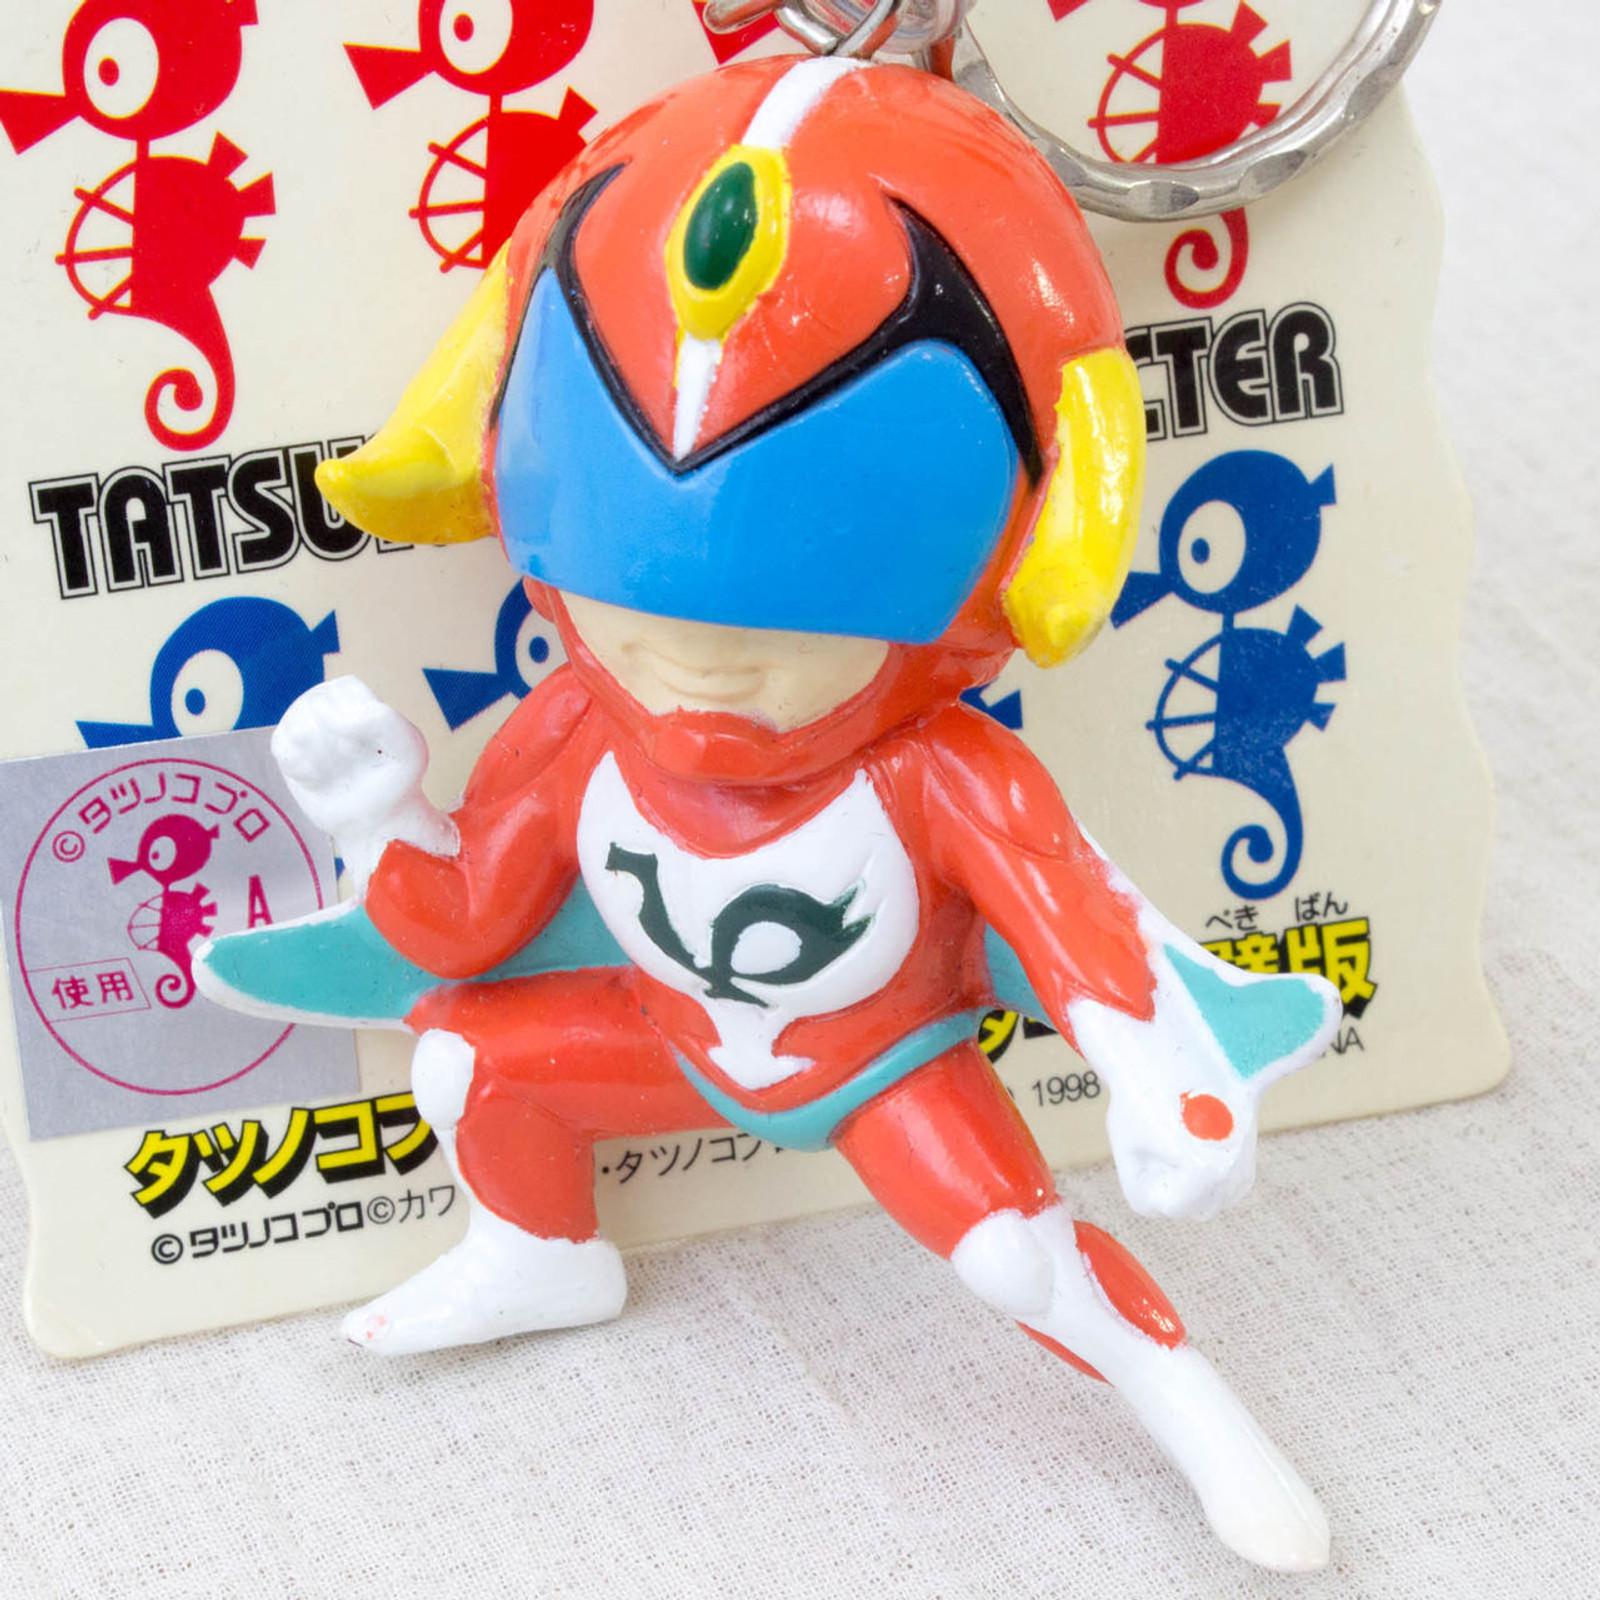 Hurricane Polymar Mascot Figure Key Chain Tatsunoko Pro JAPAN ANIME MANGA